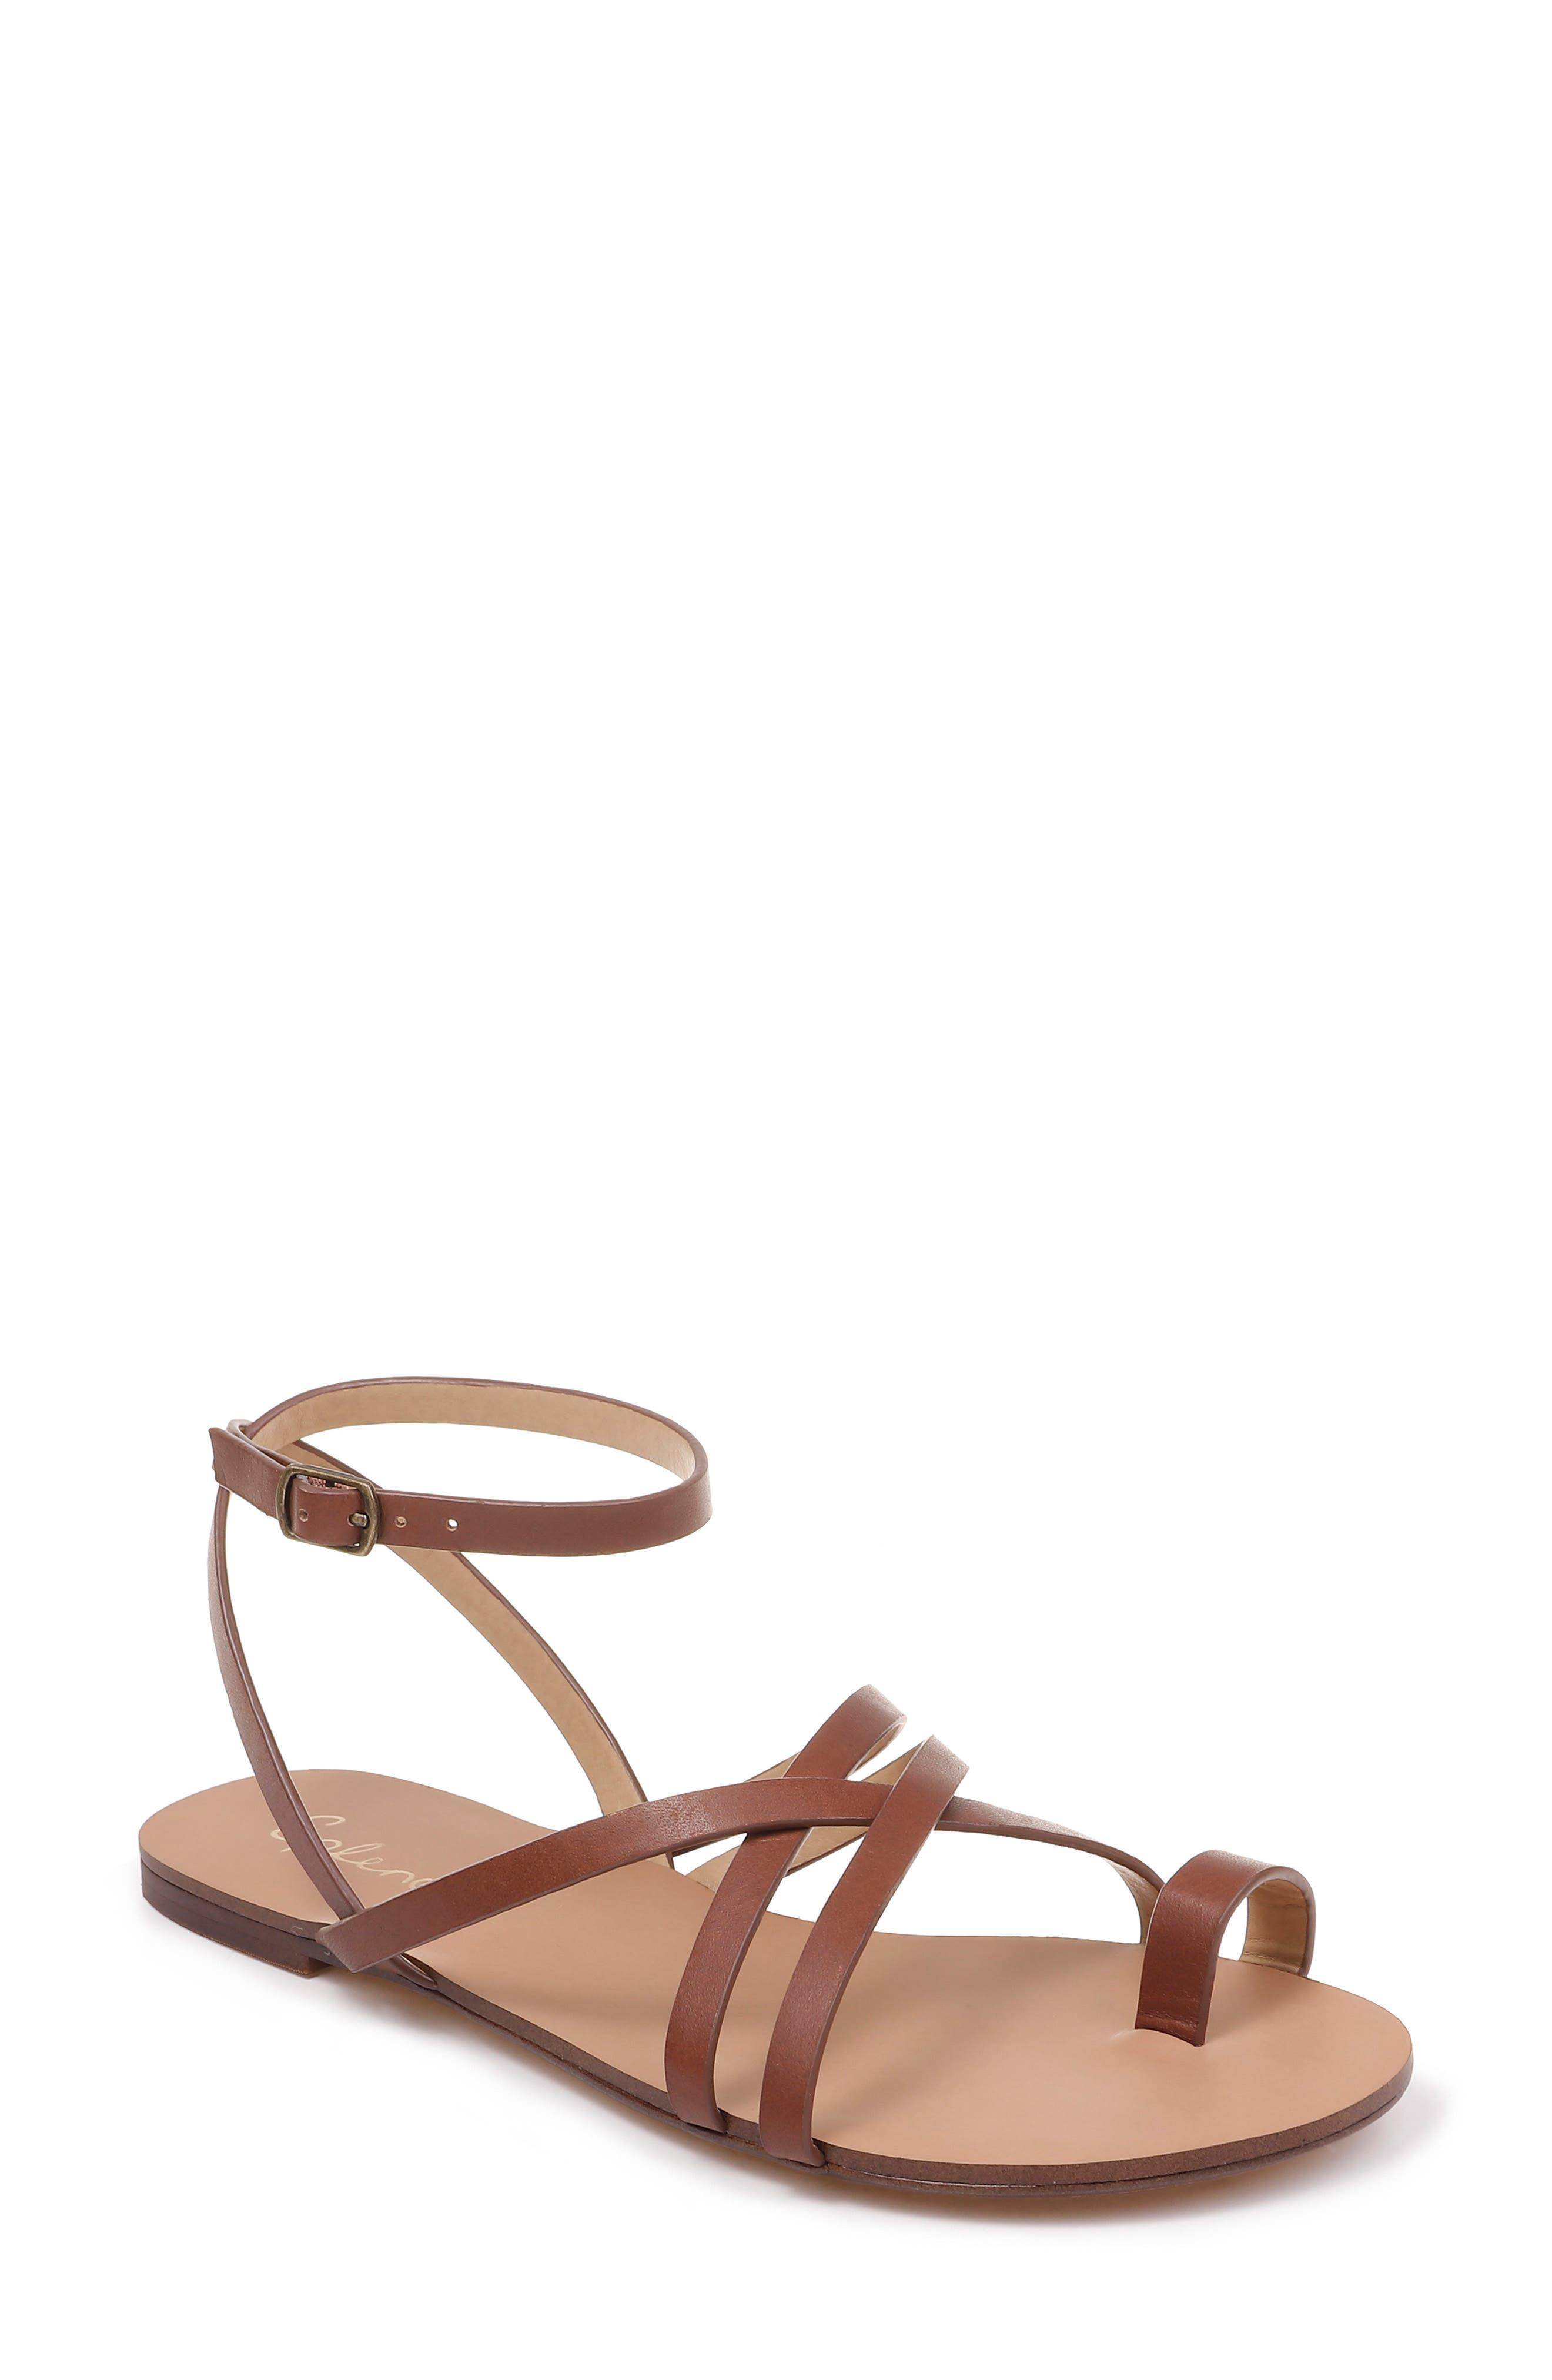 Splendid Sully Strappy Toe Loop Sandal- Brown